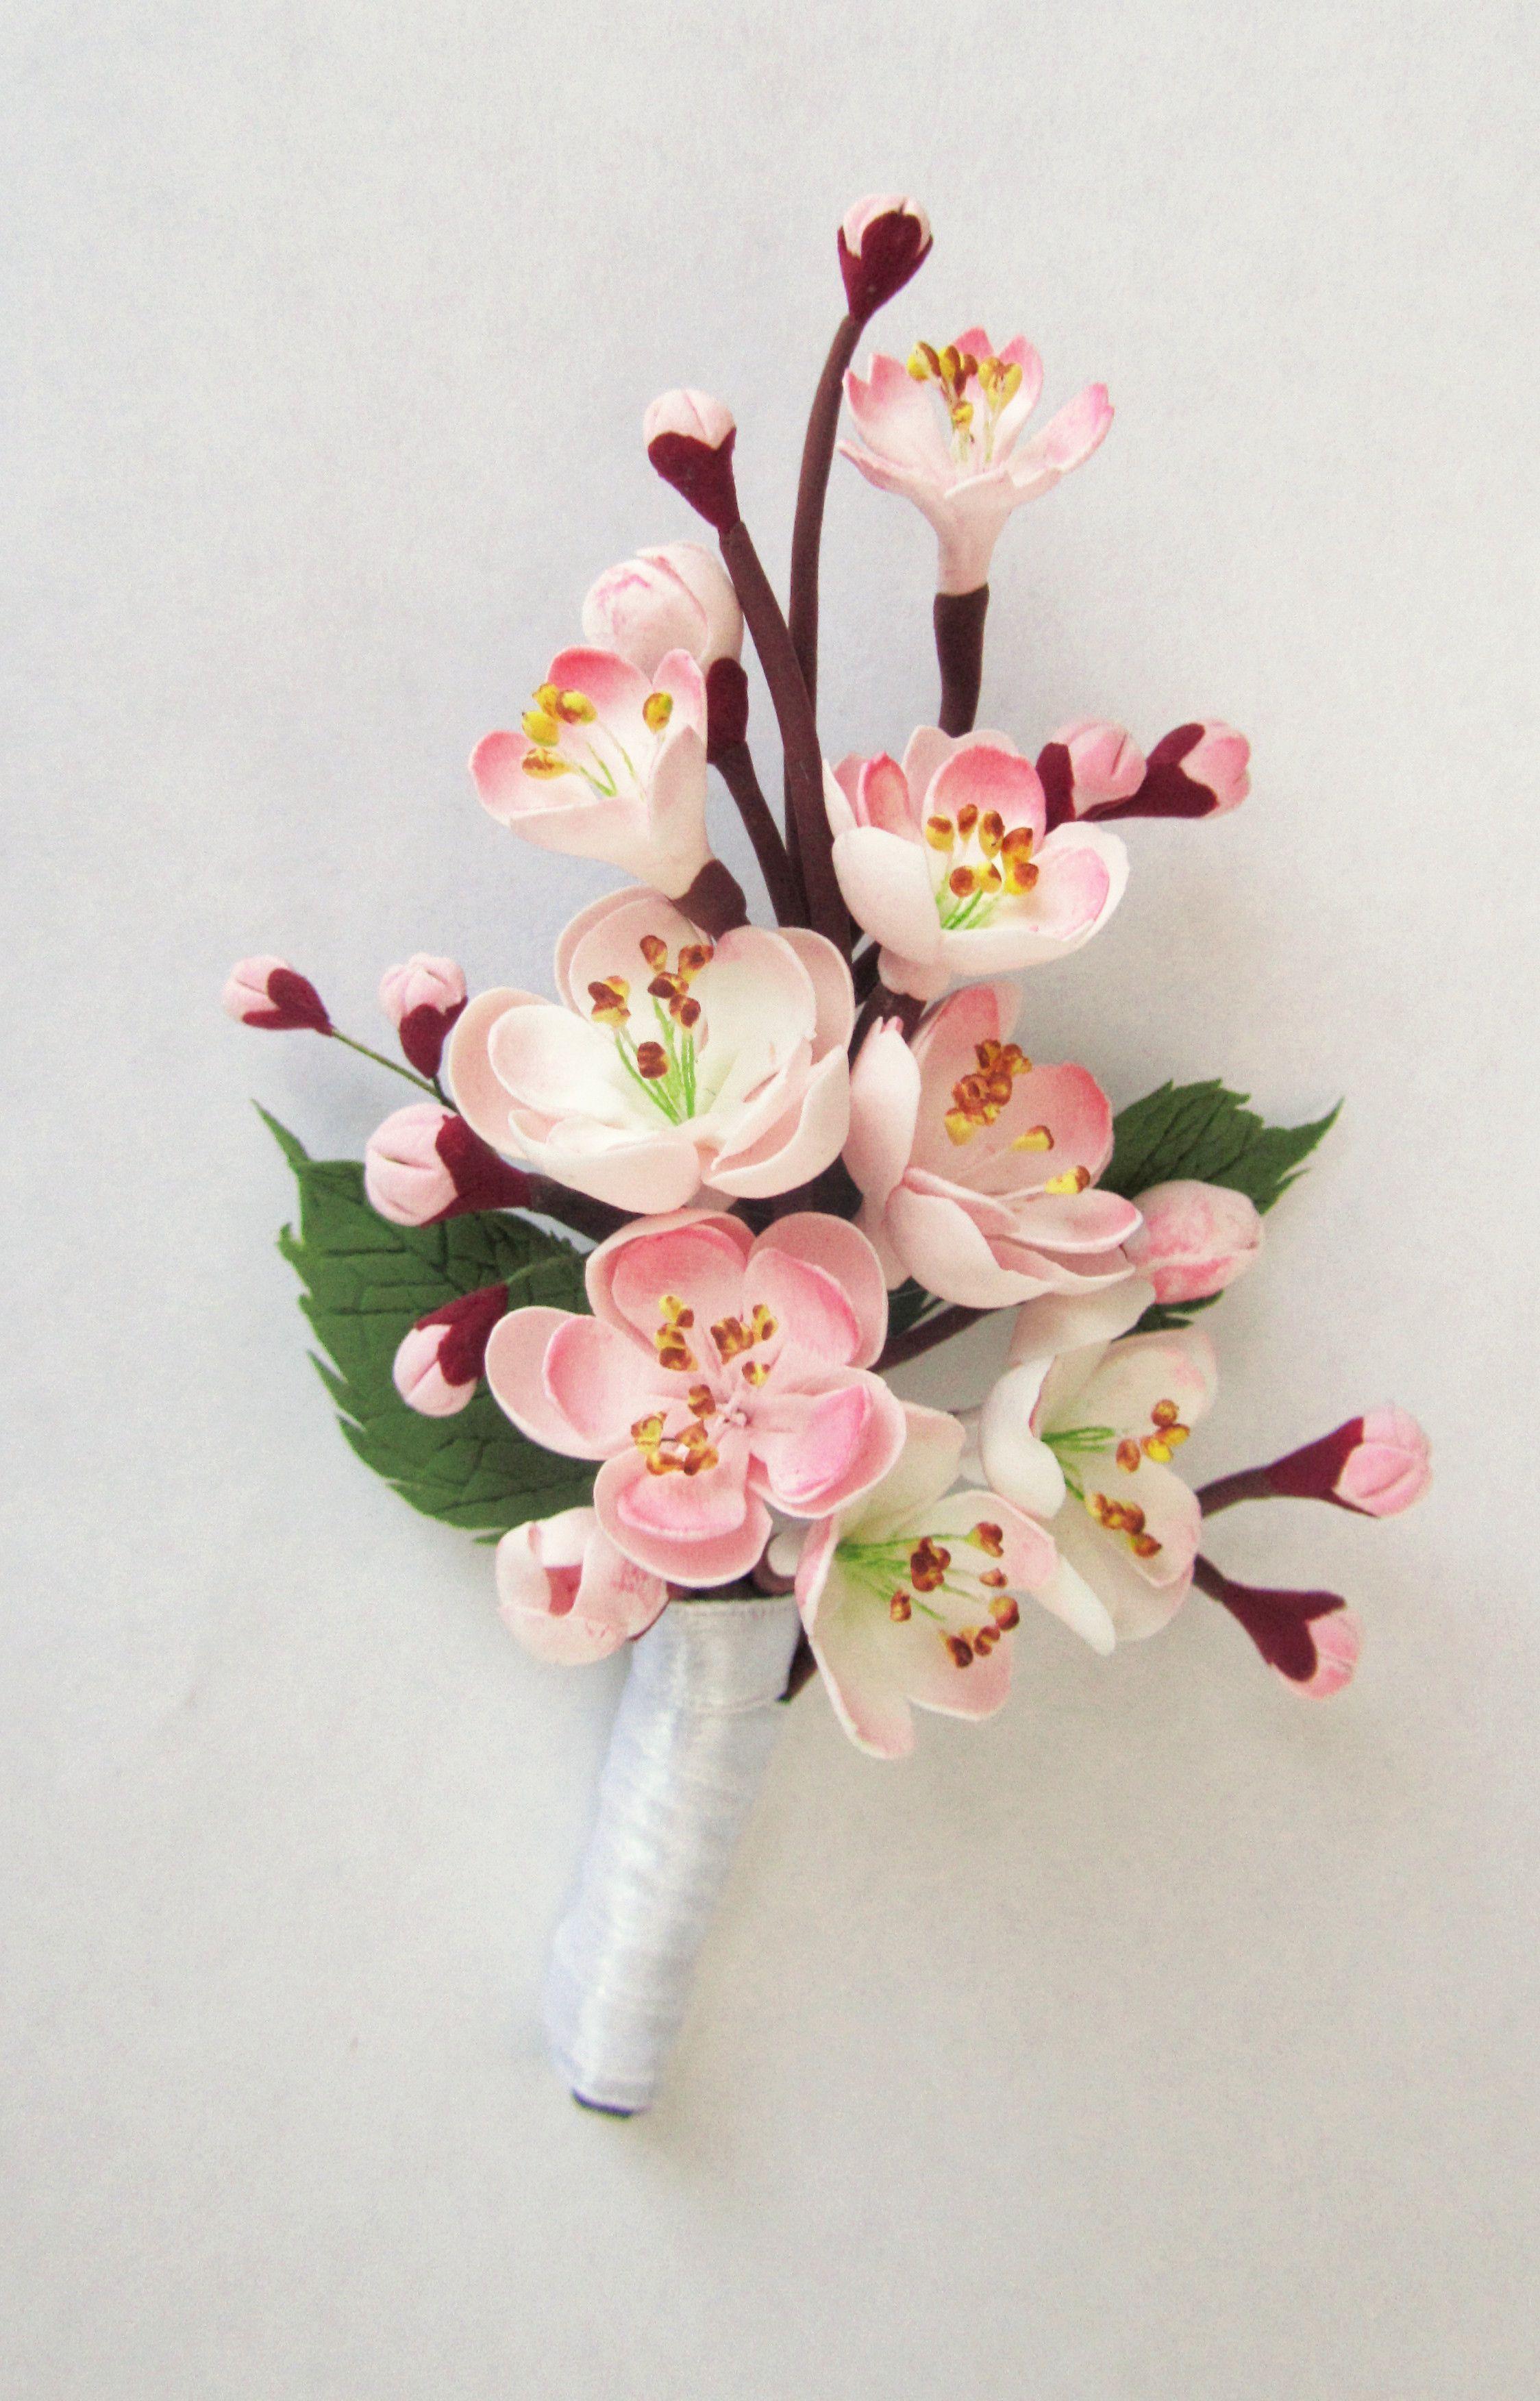 Brilliant 25 Beautiful Sakura Flower Bouquet For Wedding Https Weddingtopi Cherry Blossom Wedding Bouquet Cherry Blossom Wedding Theme Cherry Blossom Wedding